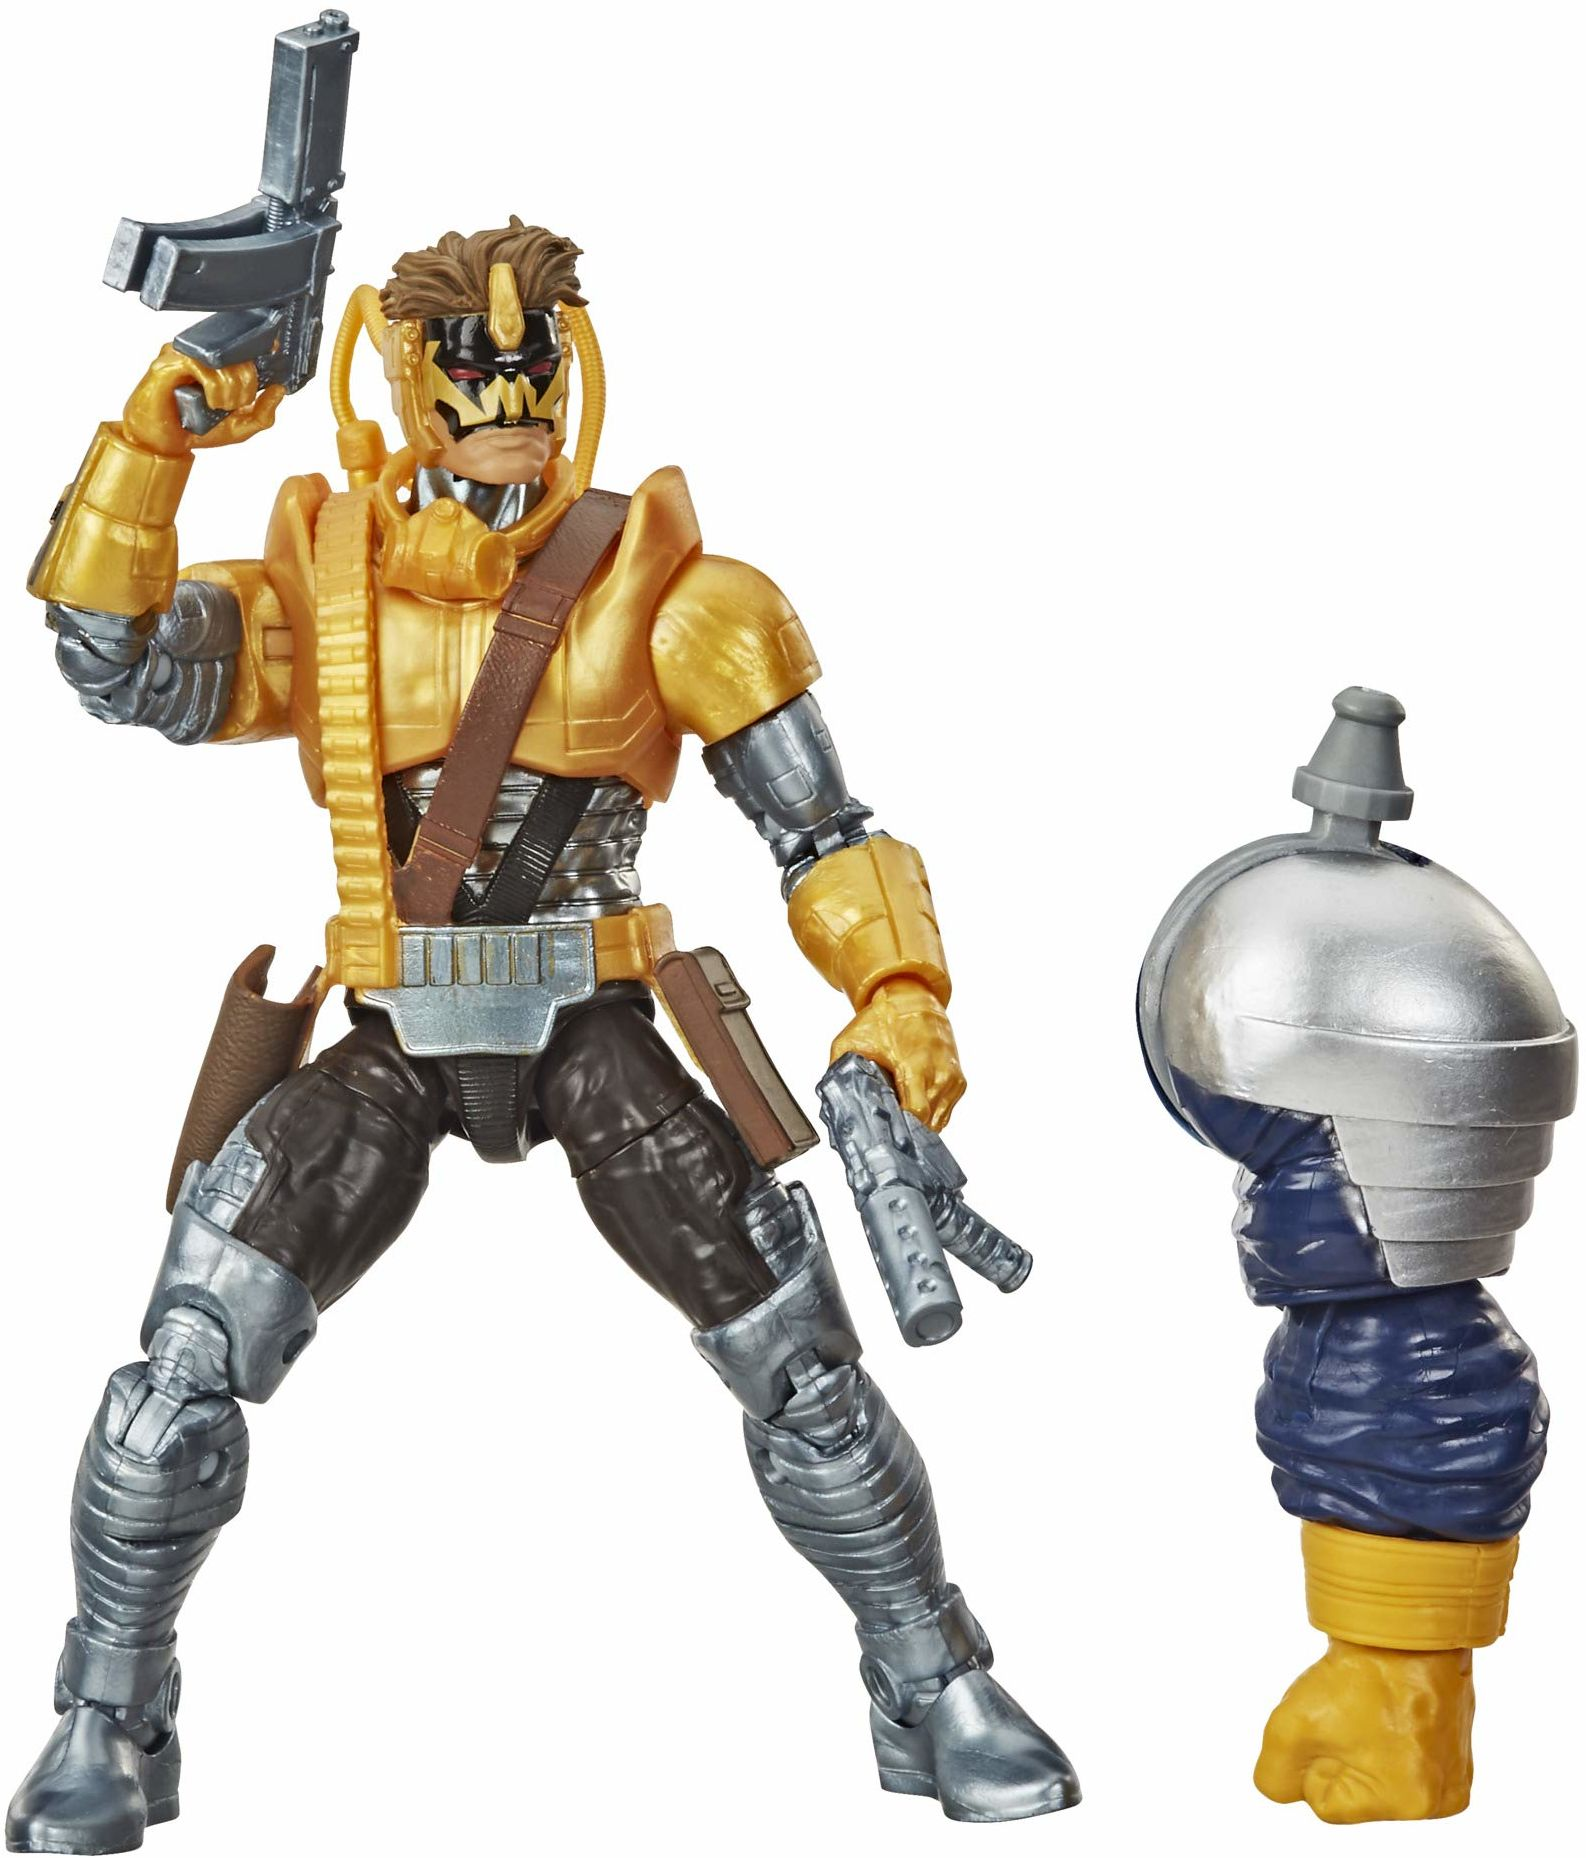 Hasbro Marvel legendy seria Deadpool kolekcja 15 cm Marvel''s Maverick figurka zabawka design premium i 2 akcesoria